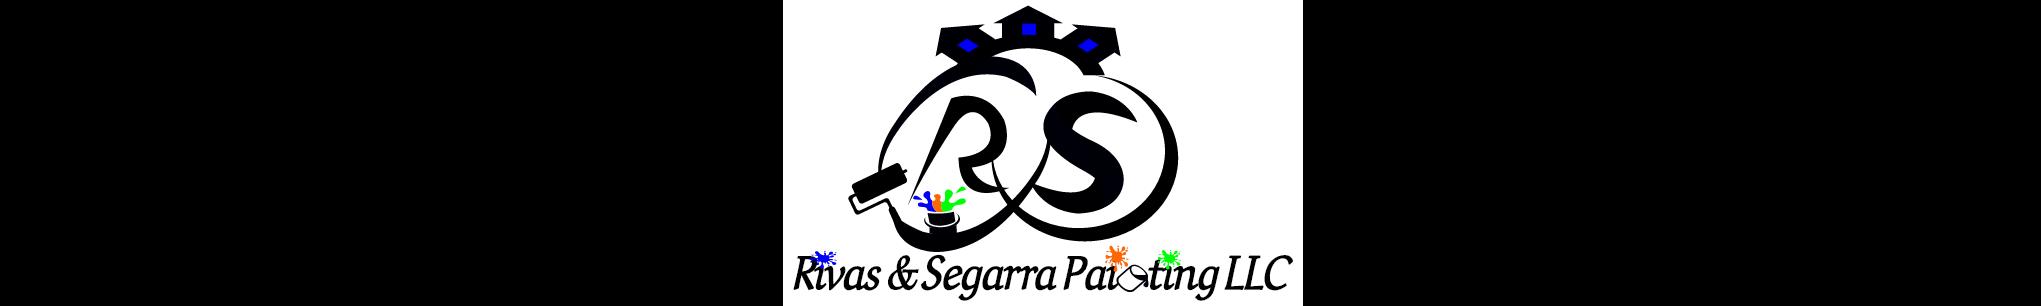 Rivas Amp Segarra Painting Llc Meriden Ct 06450 Networx